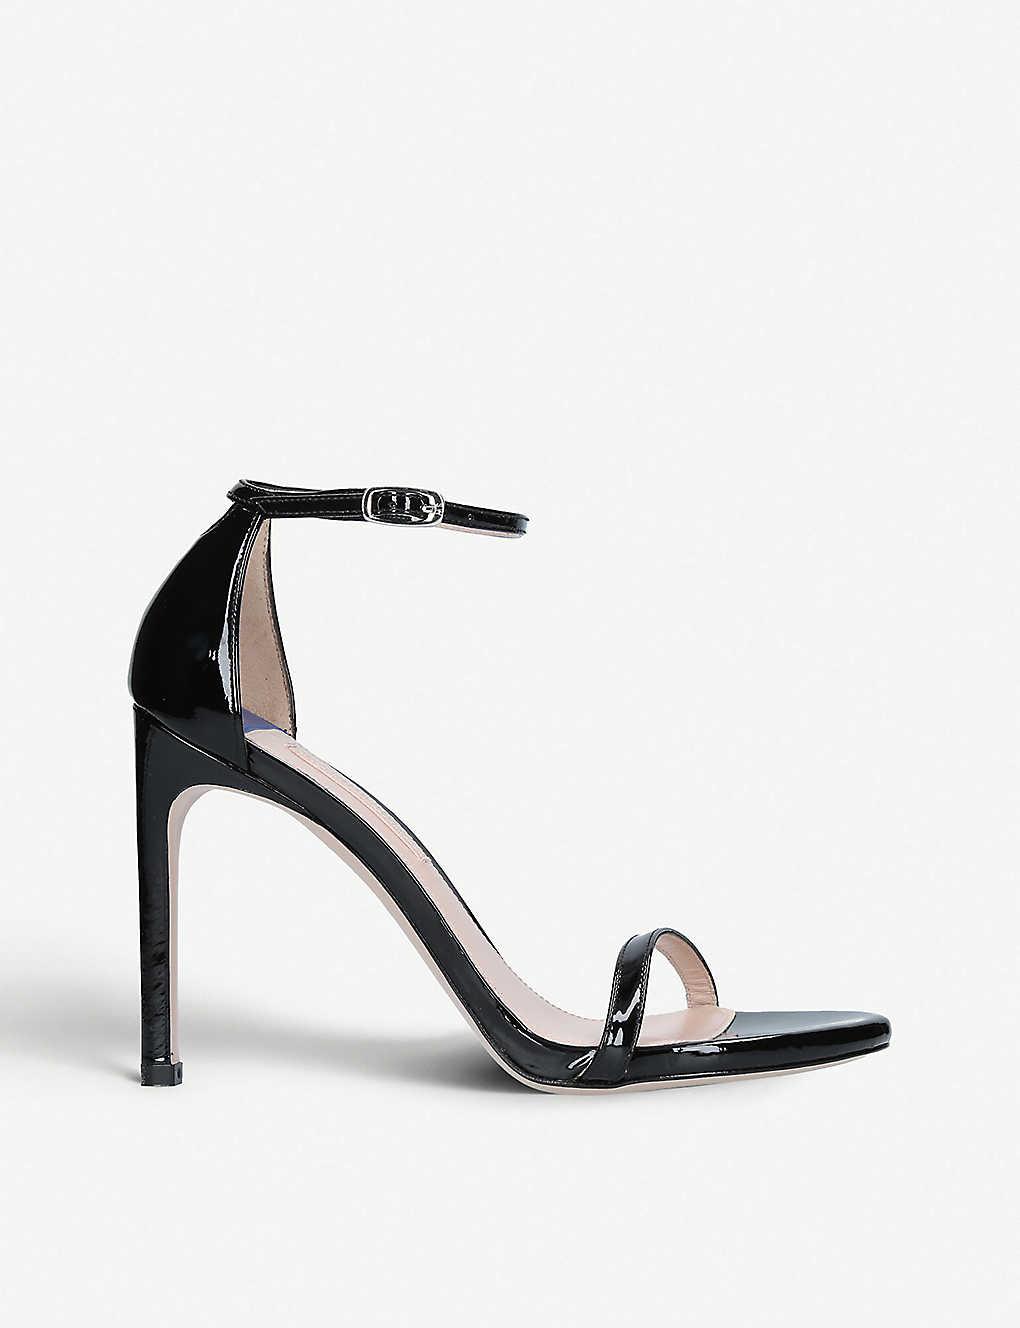 Stuart Weitzman Shoes Nudistsong 100 patent leather sandals